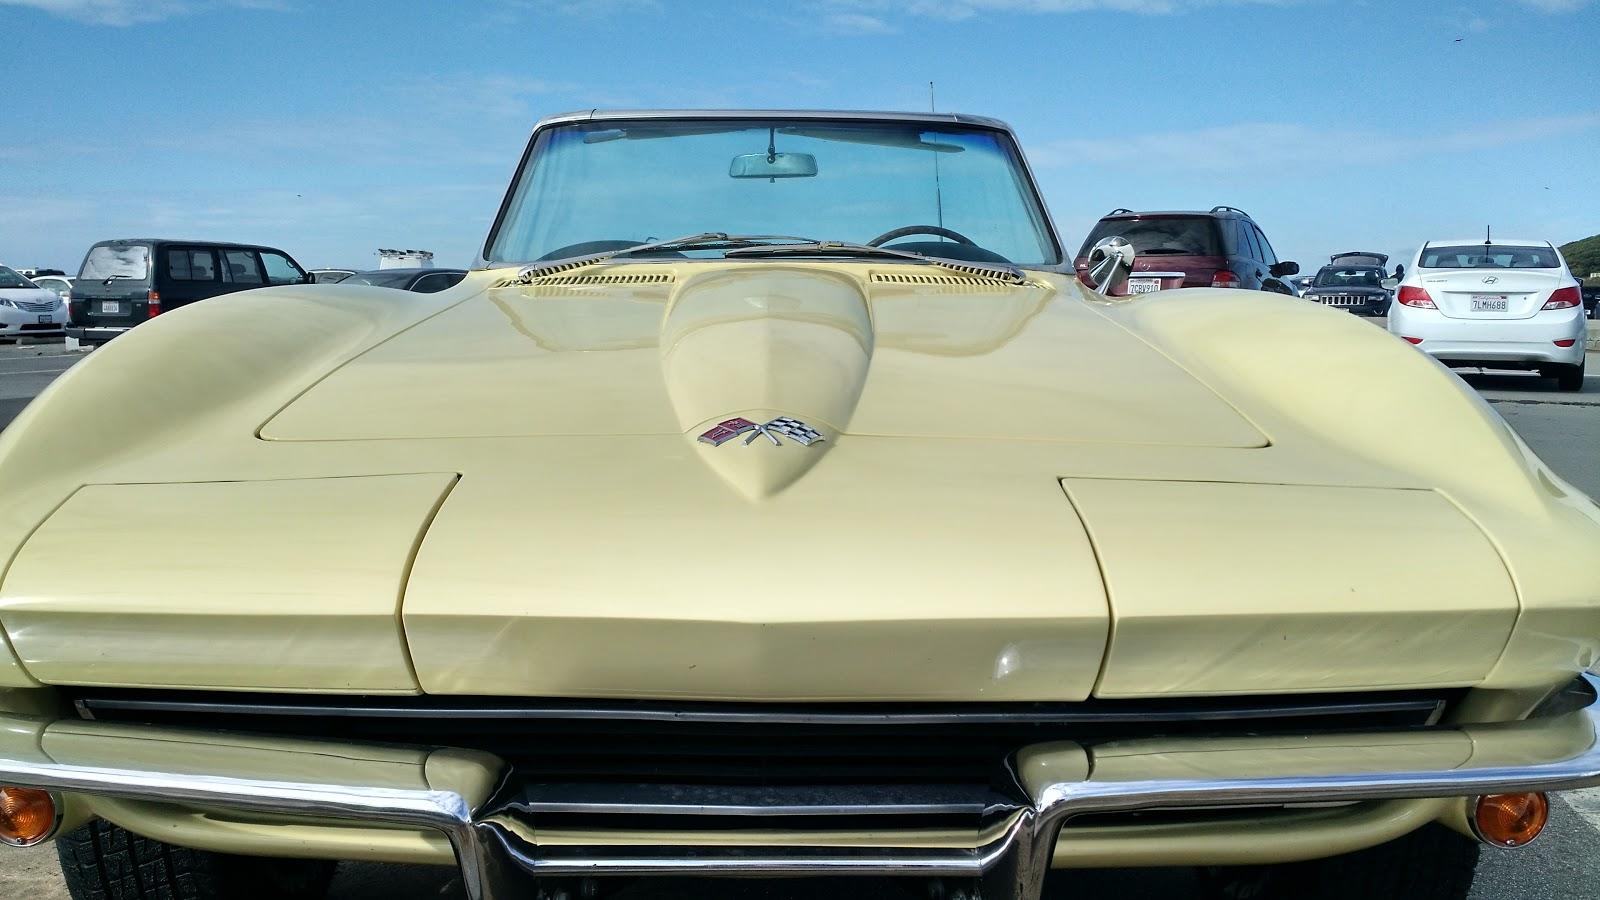 Car #2: 1965 Corvette Convertible (aka midyear C2)